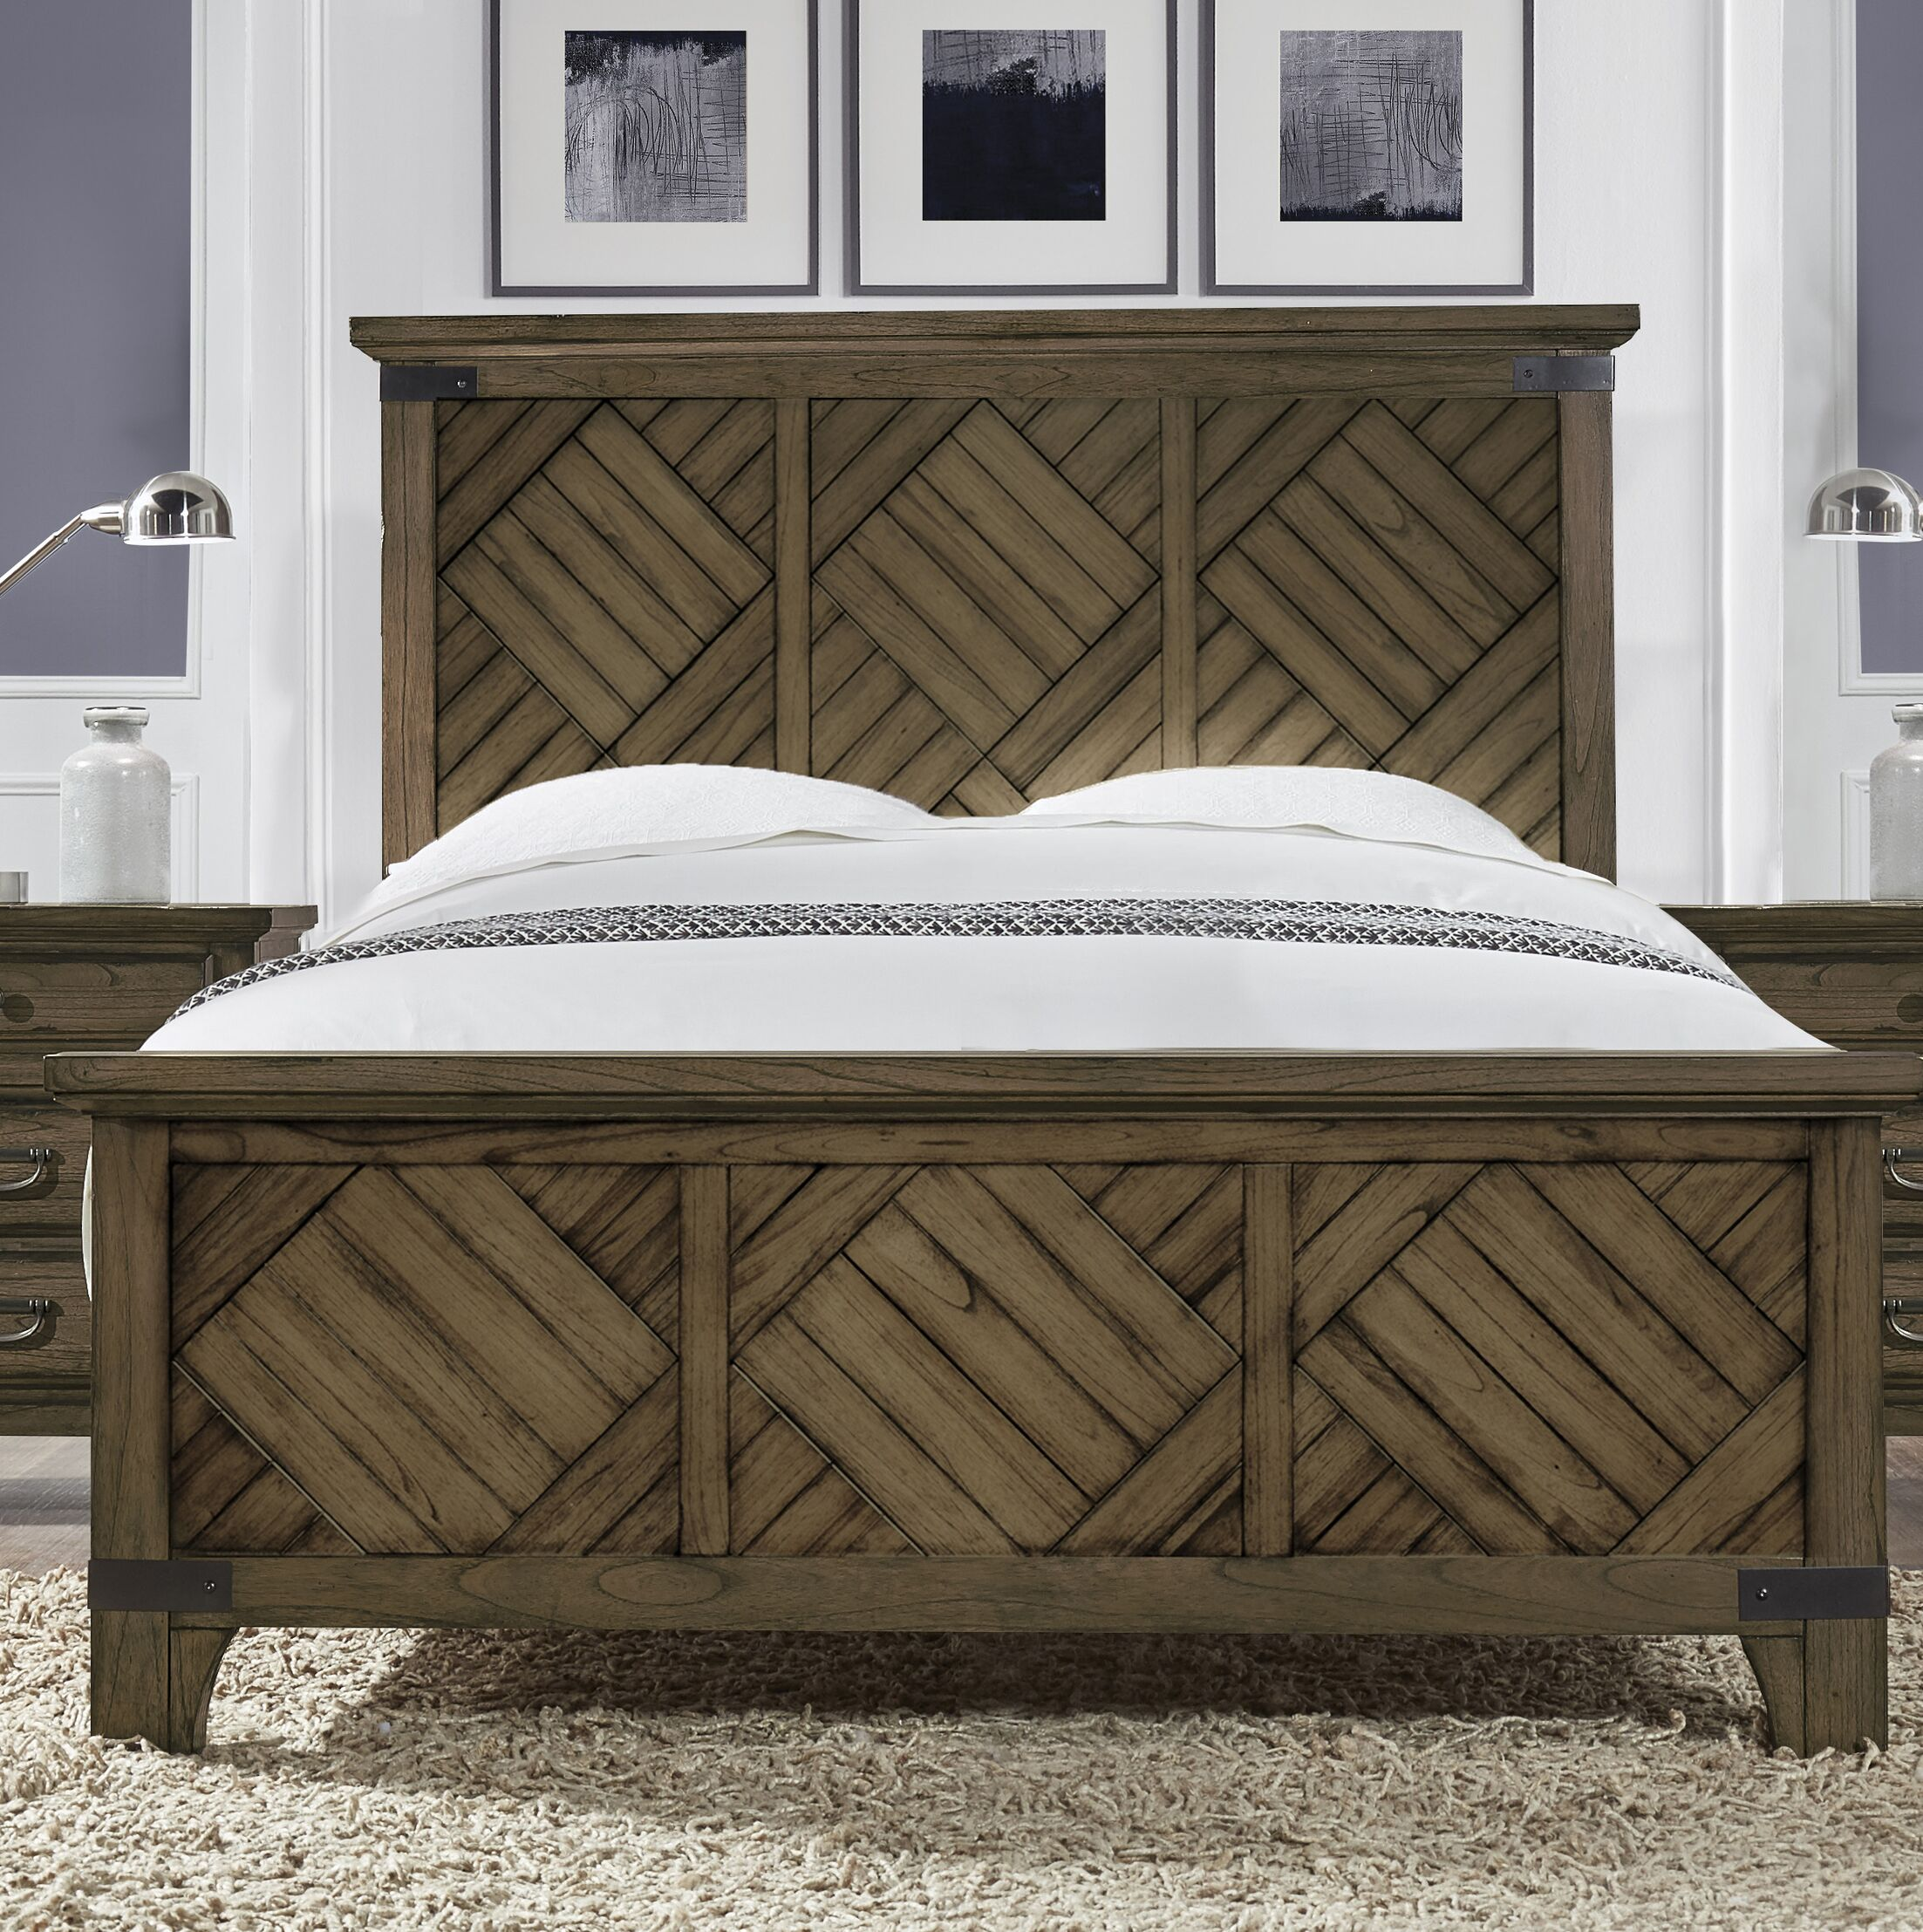 Mcfaddin Platform Bed Size: King